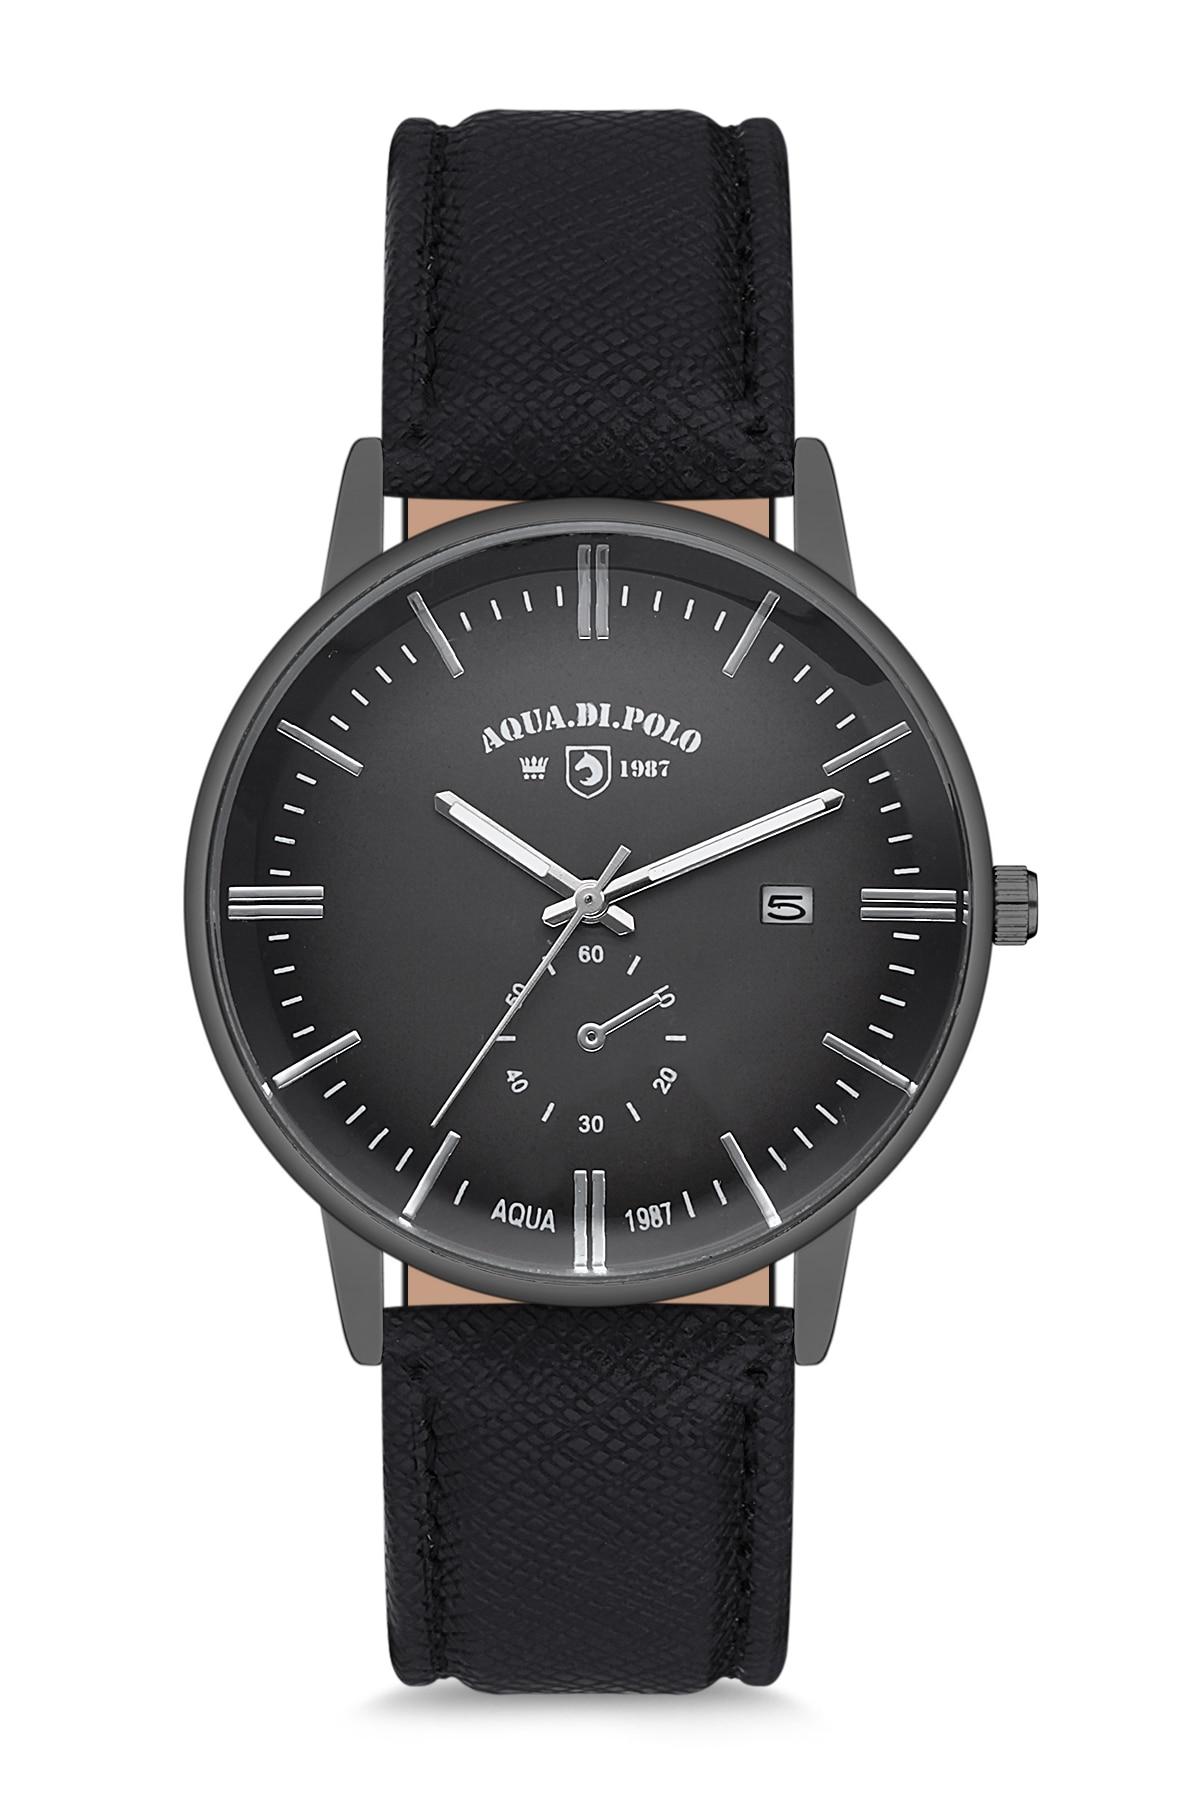 2020-2021 lux Model Top Brand Hot Fashion Quartz APSV1-A9460-ED333 Leather Men Wristwatch Black Aqua di Polo 1987